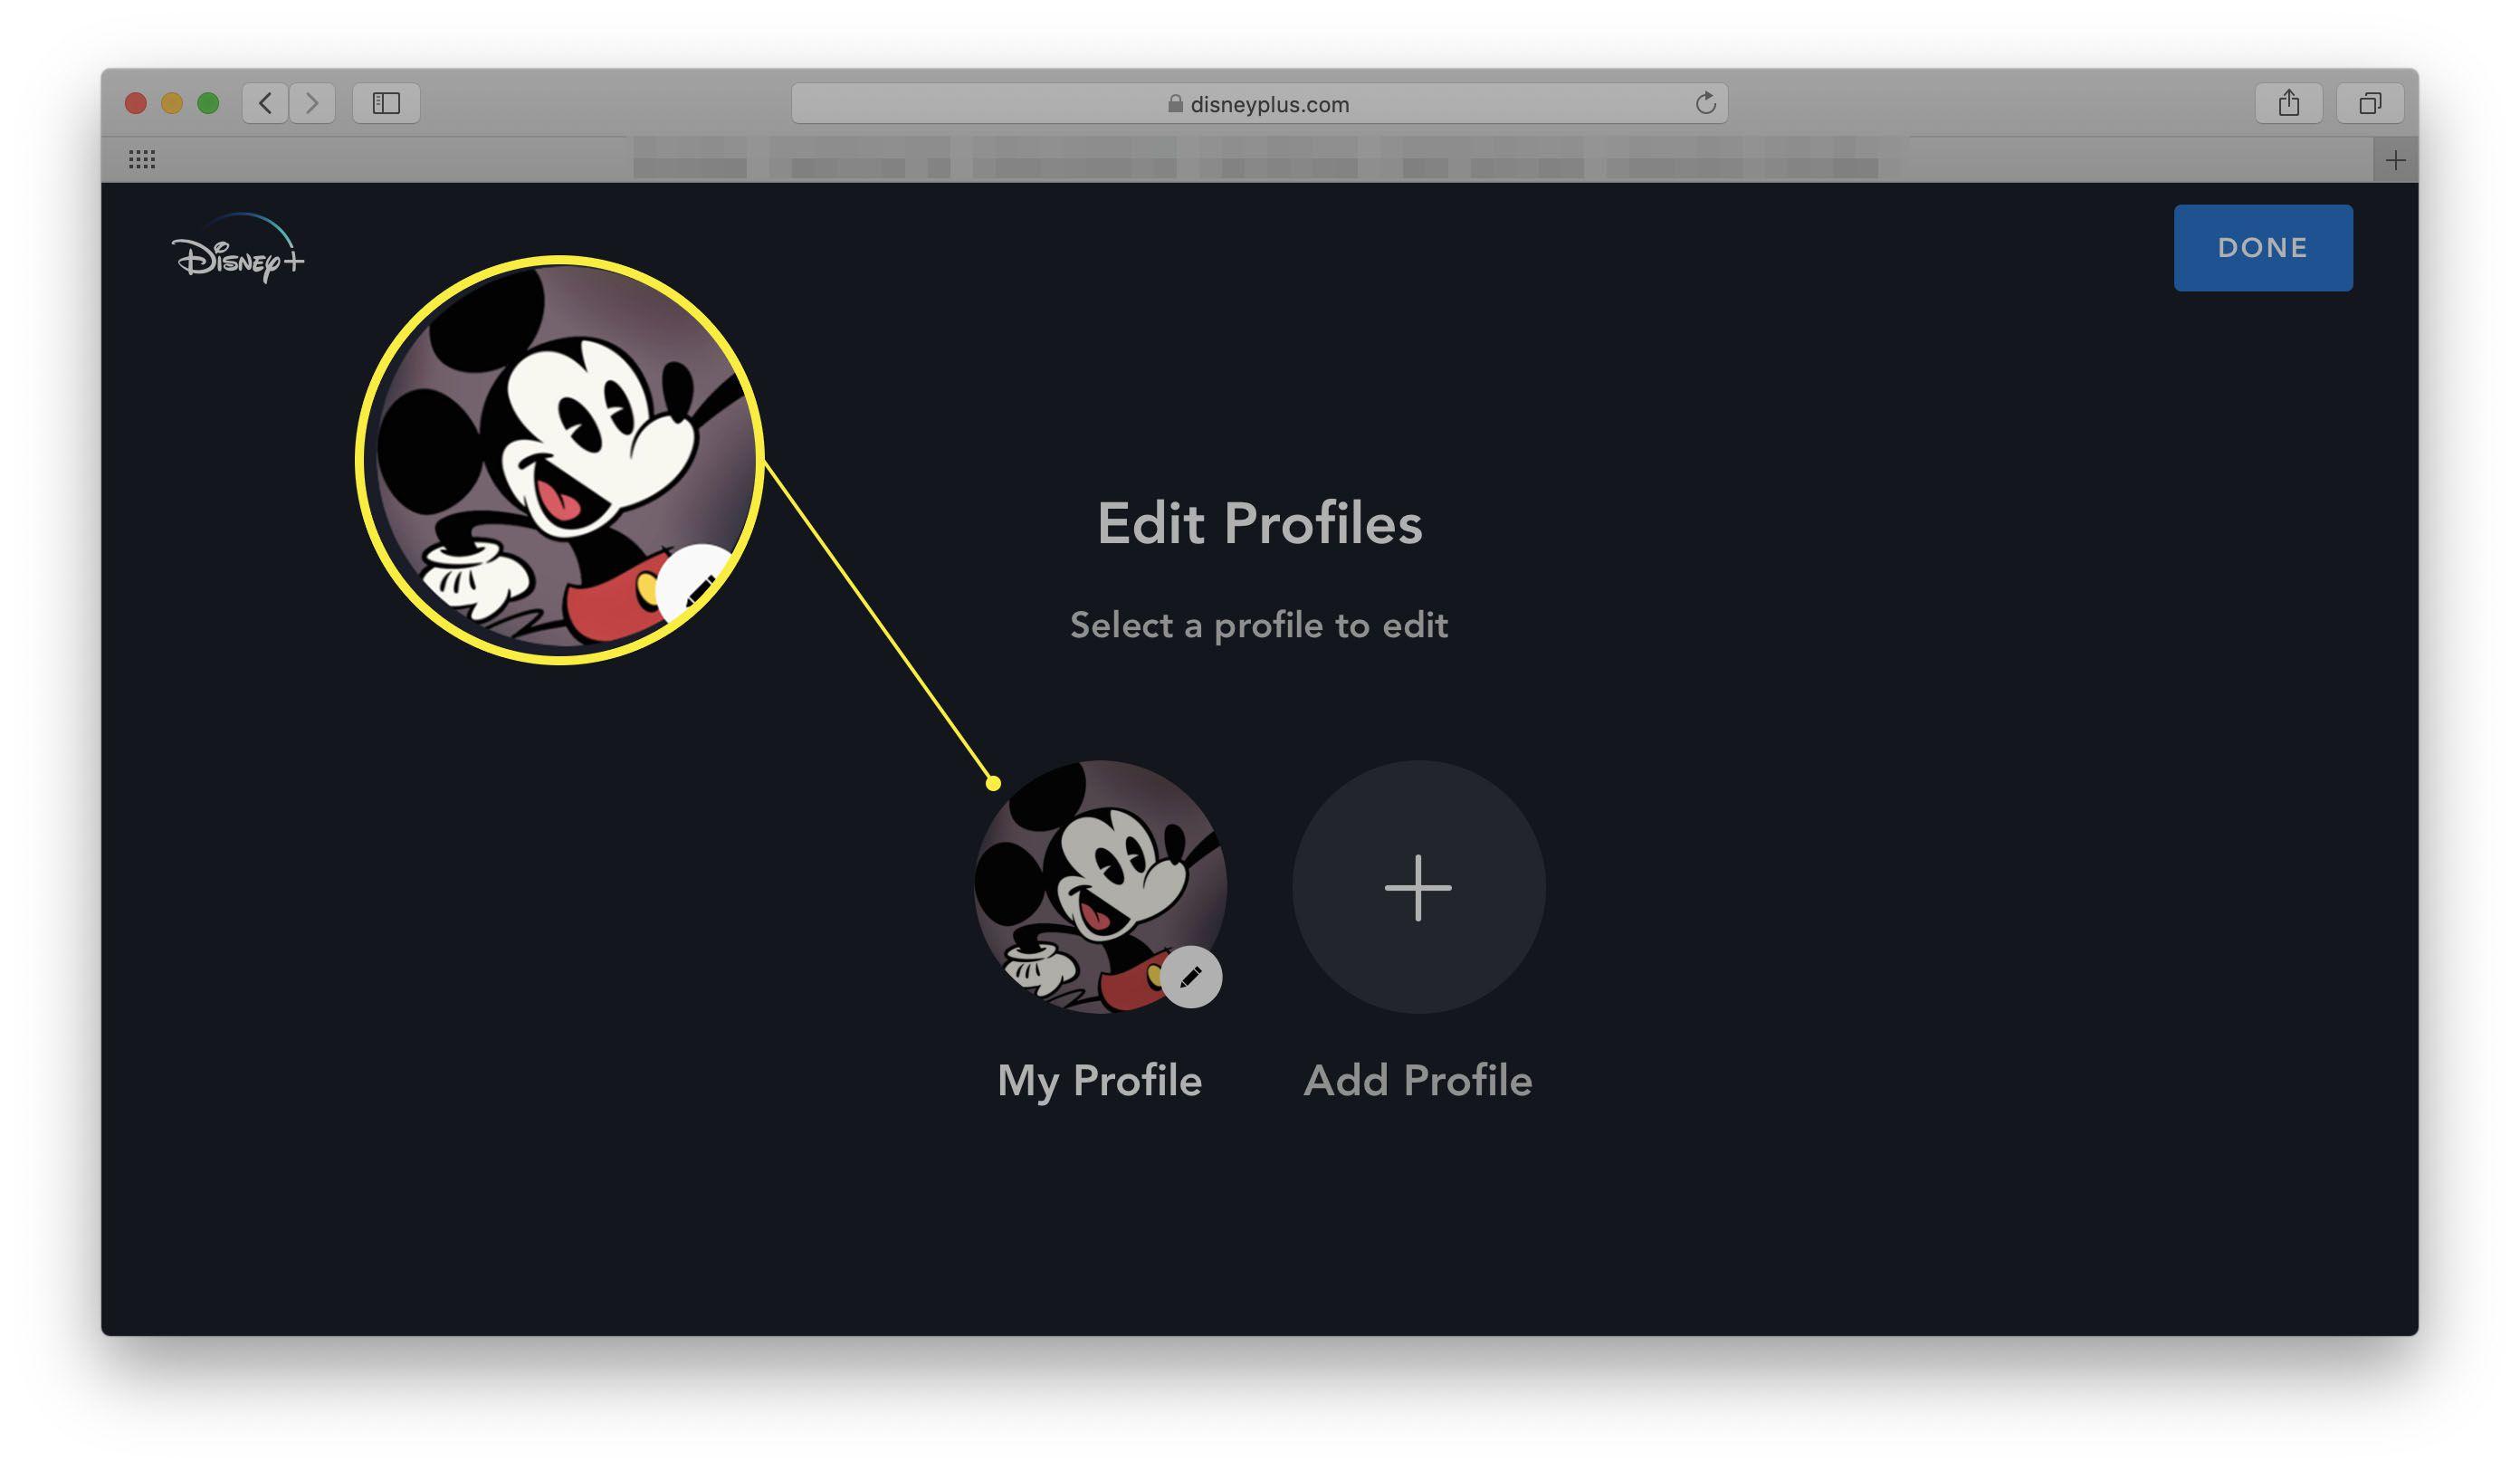 Disney+ website with Edit Profiles open